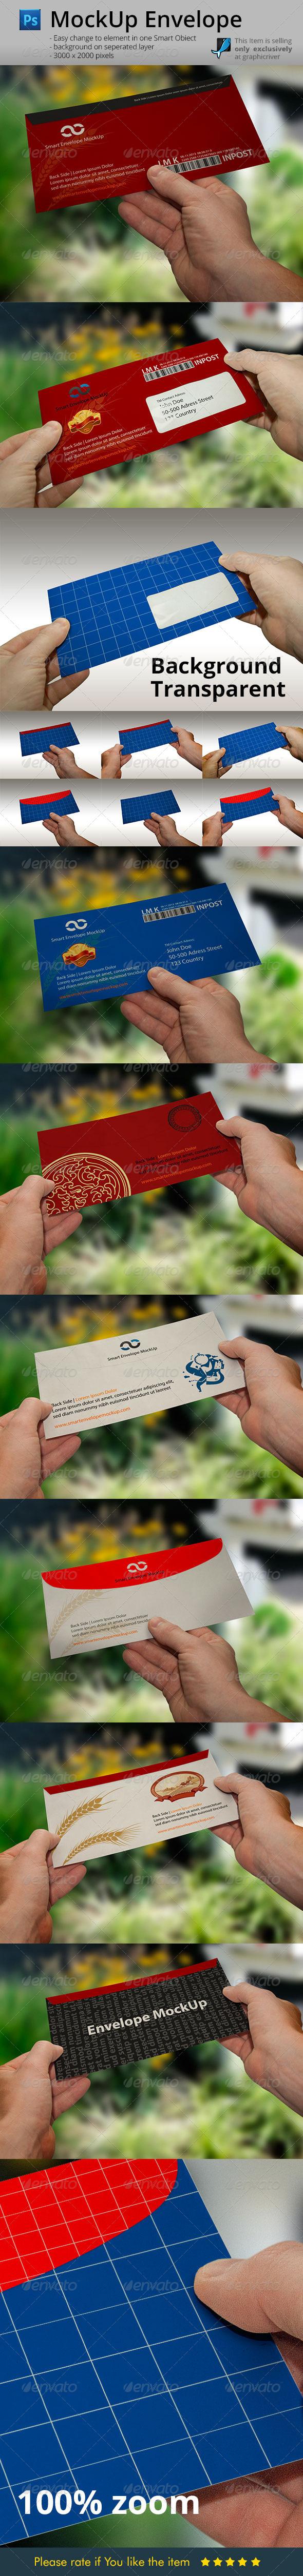 Envelope Hands Mock-Up - Miscellaneous Print